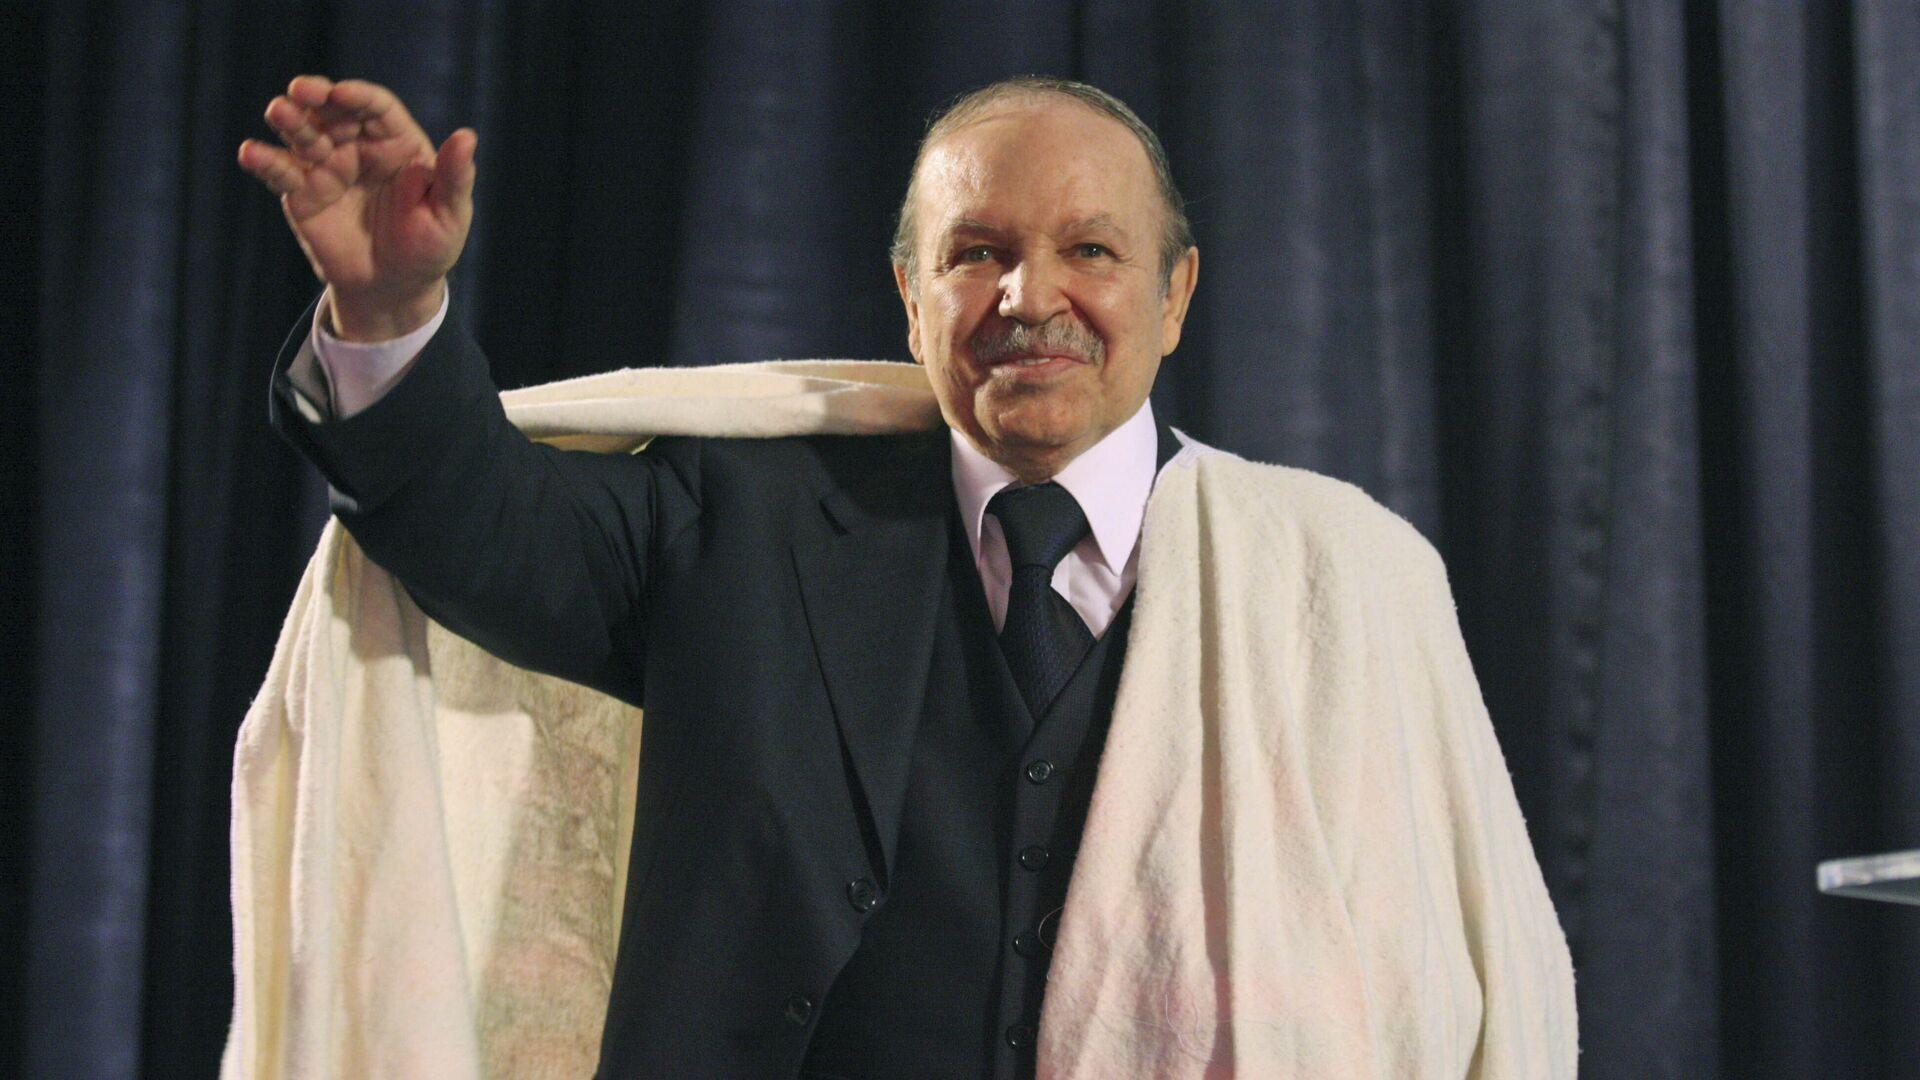 Abdelaziz Bouteflika en 2009 - Sputnik France, 1920, 20.09.2021